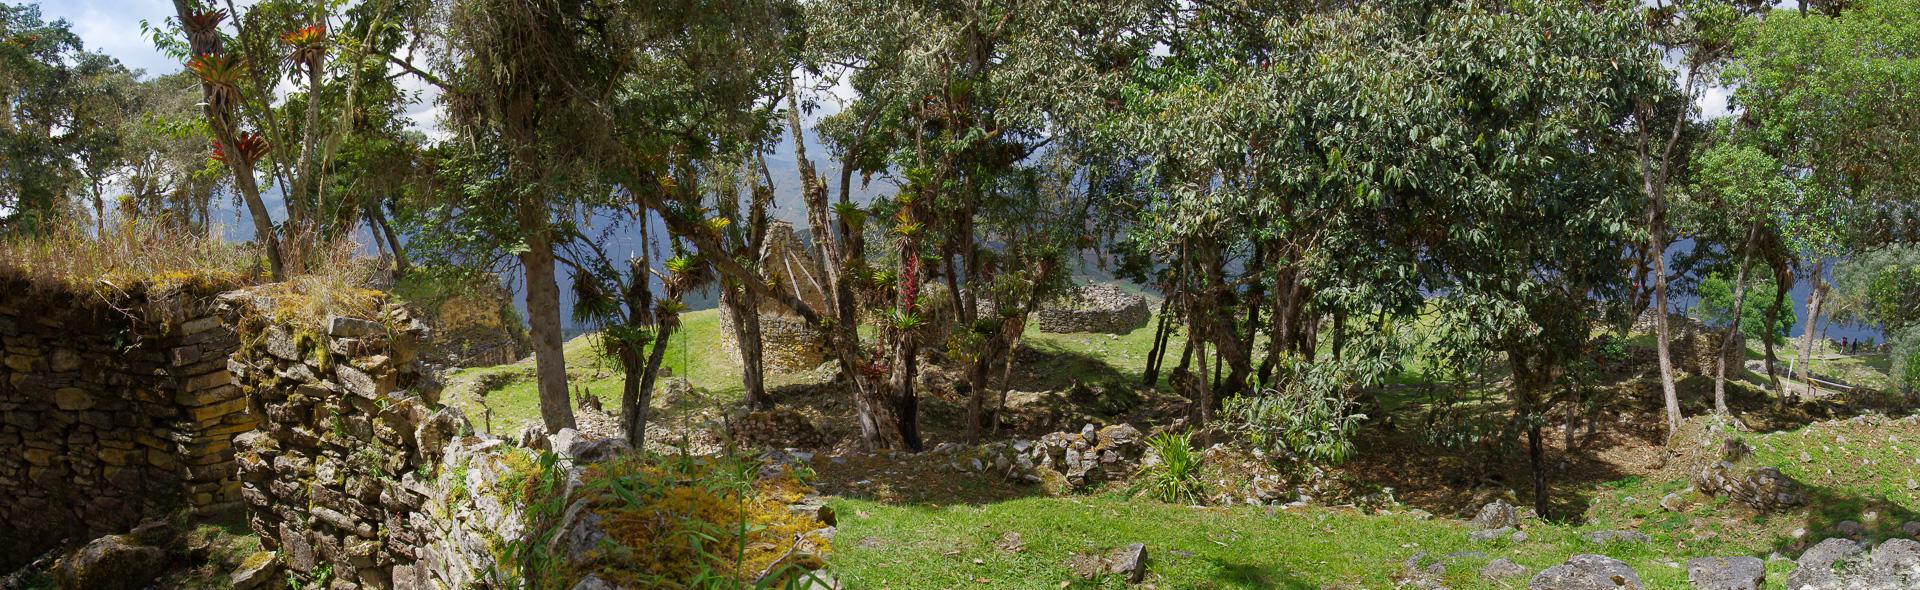 Kuelap, die Festung der Nebelkrieger